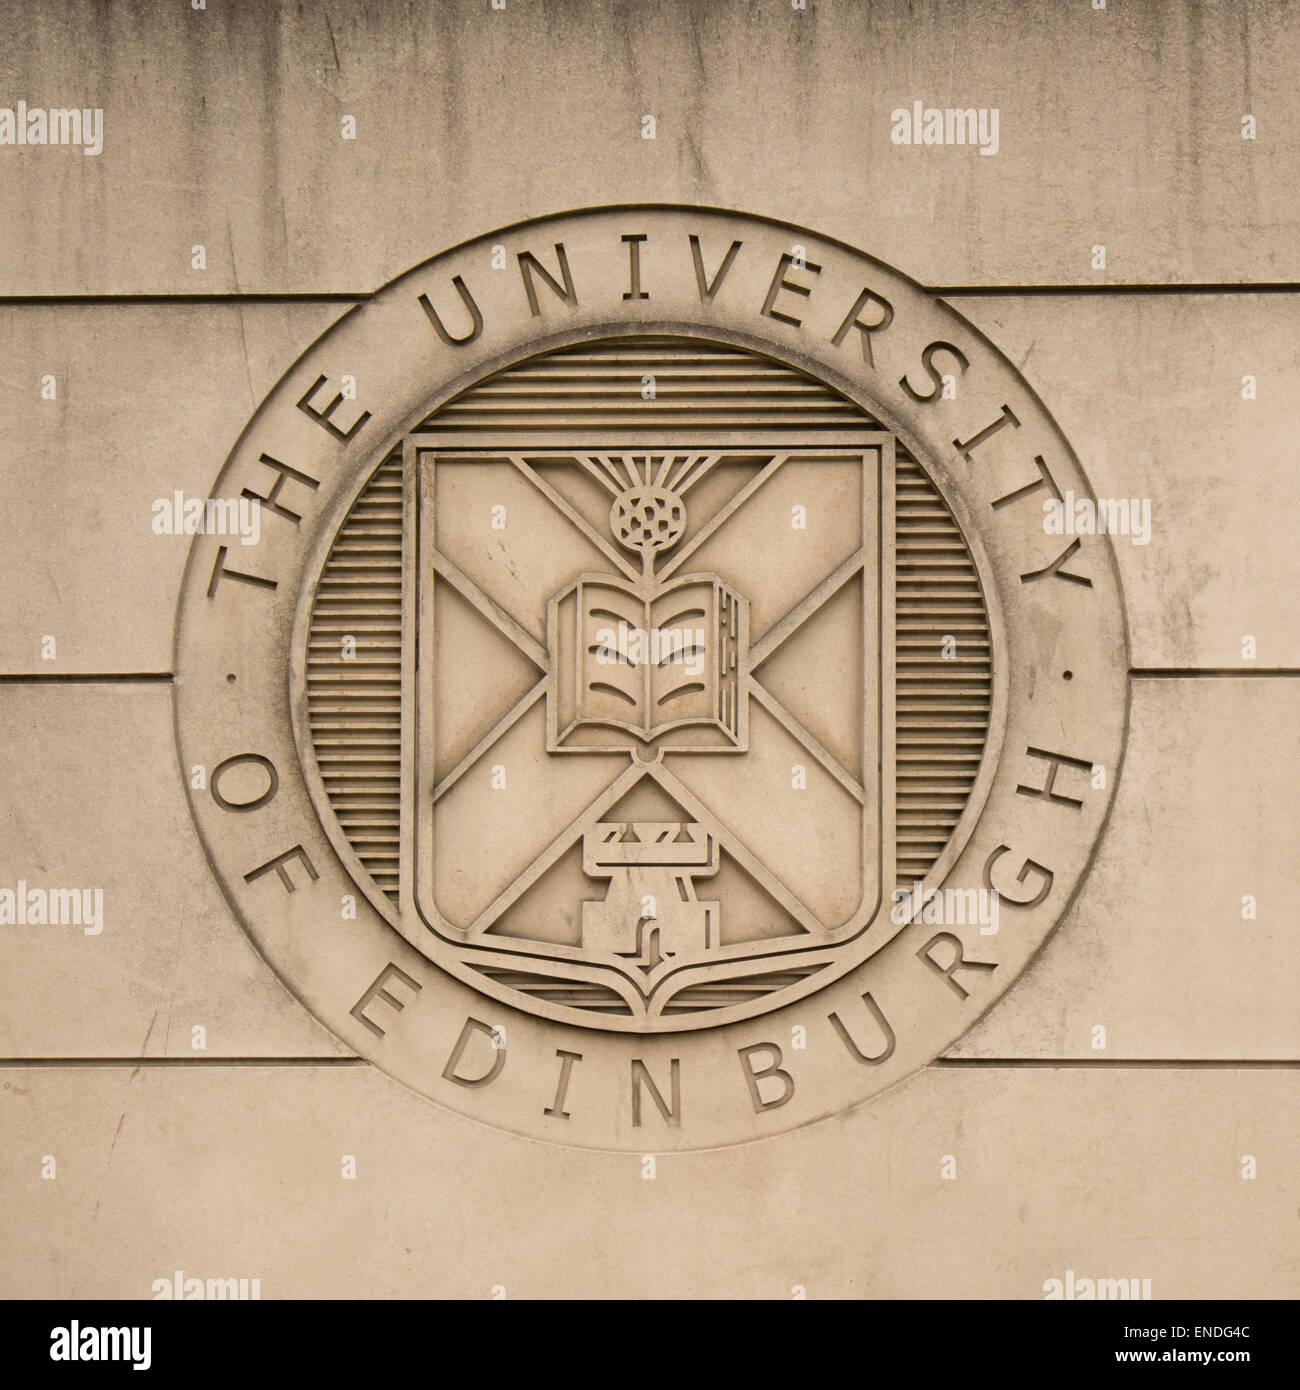 EDINBURGH, SCOTLAND, UK - 2 MAY 2015: The logo or coat of arms of The University of Edinburgh - Stock Image